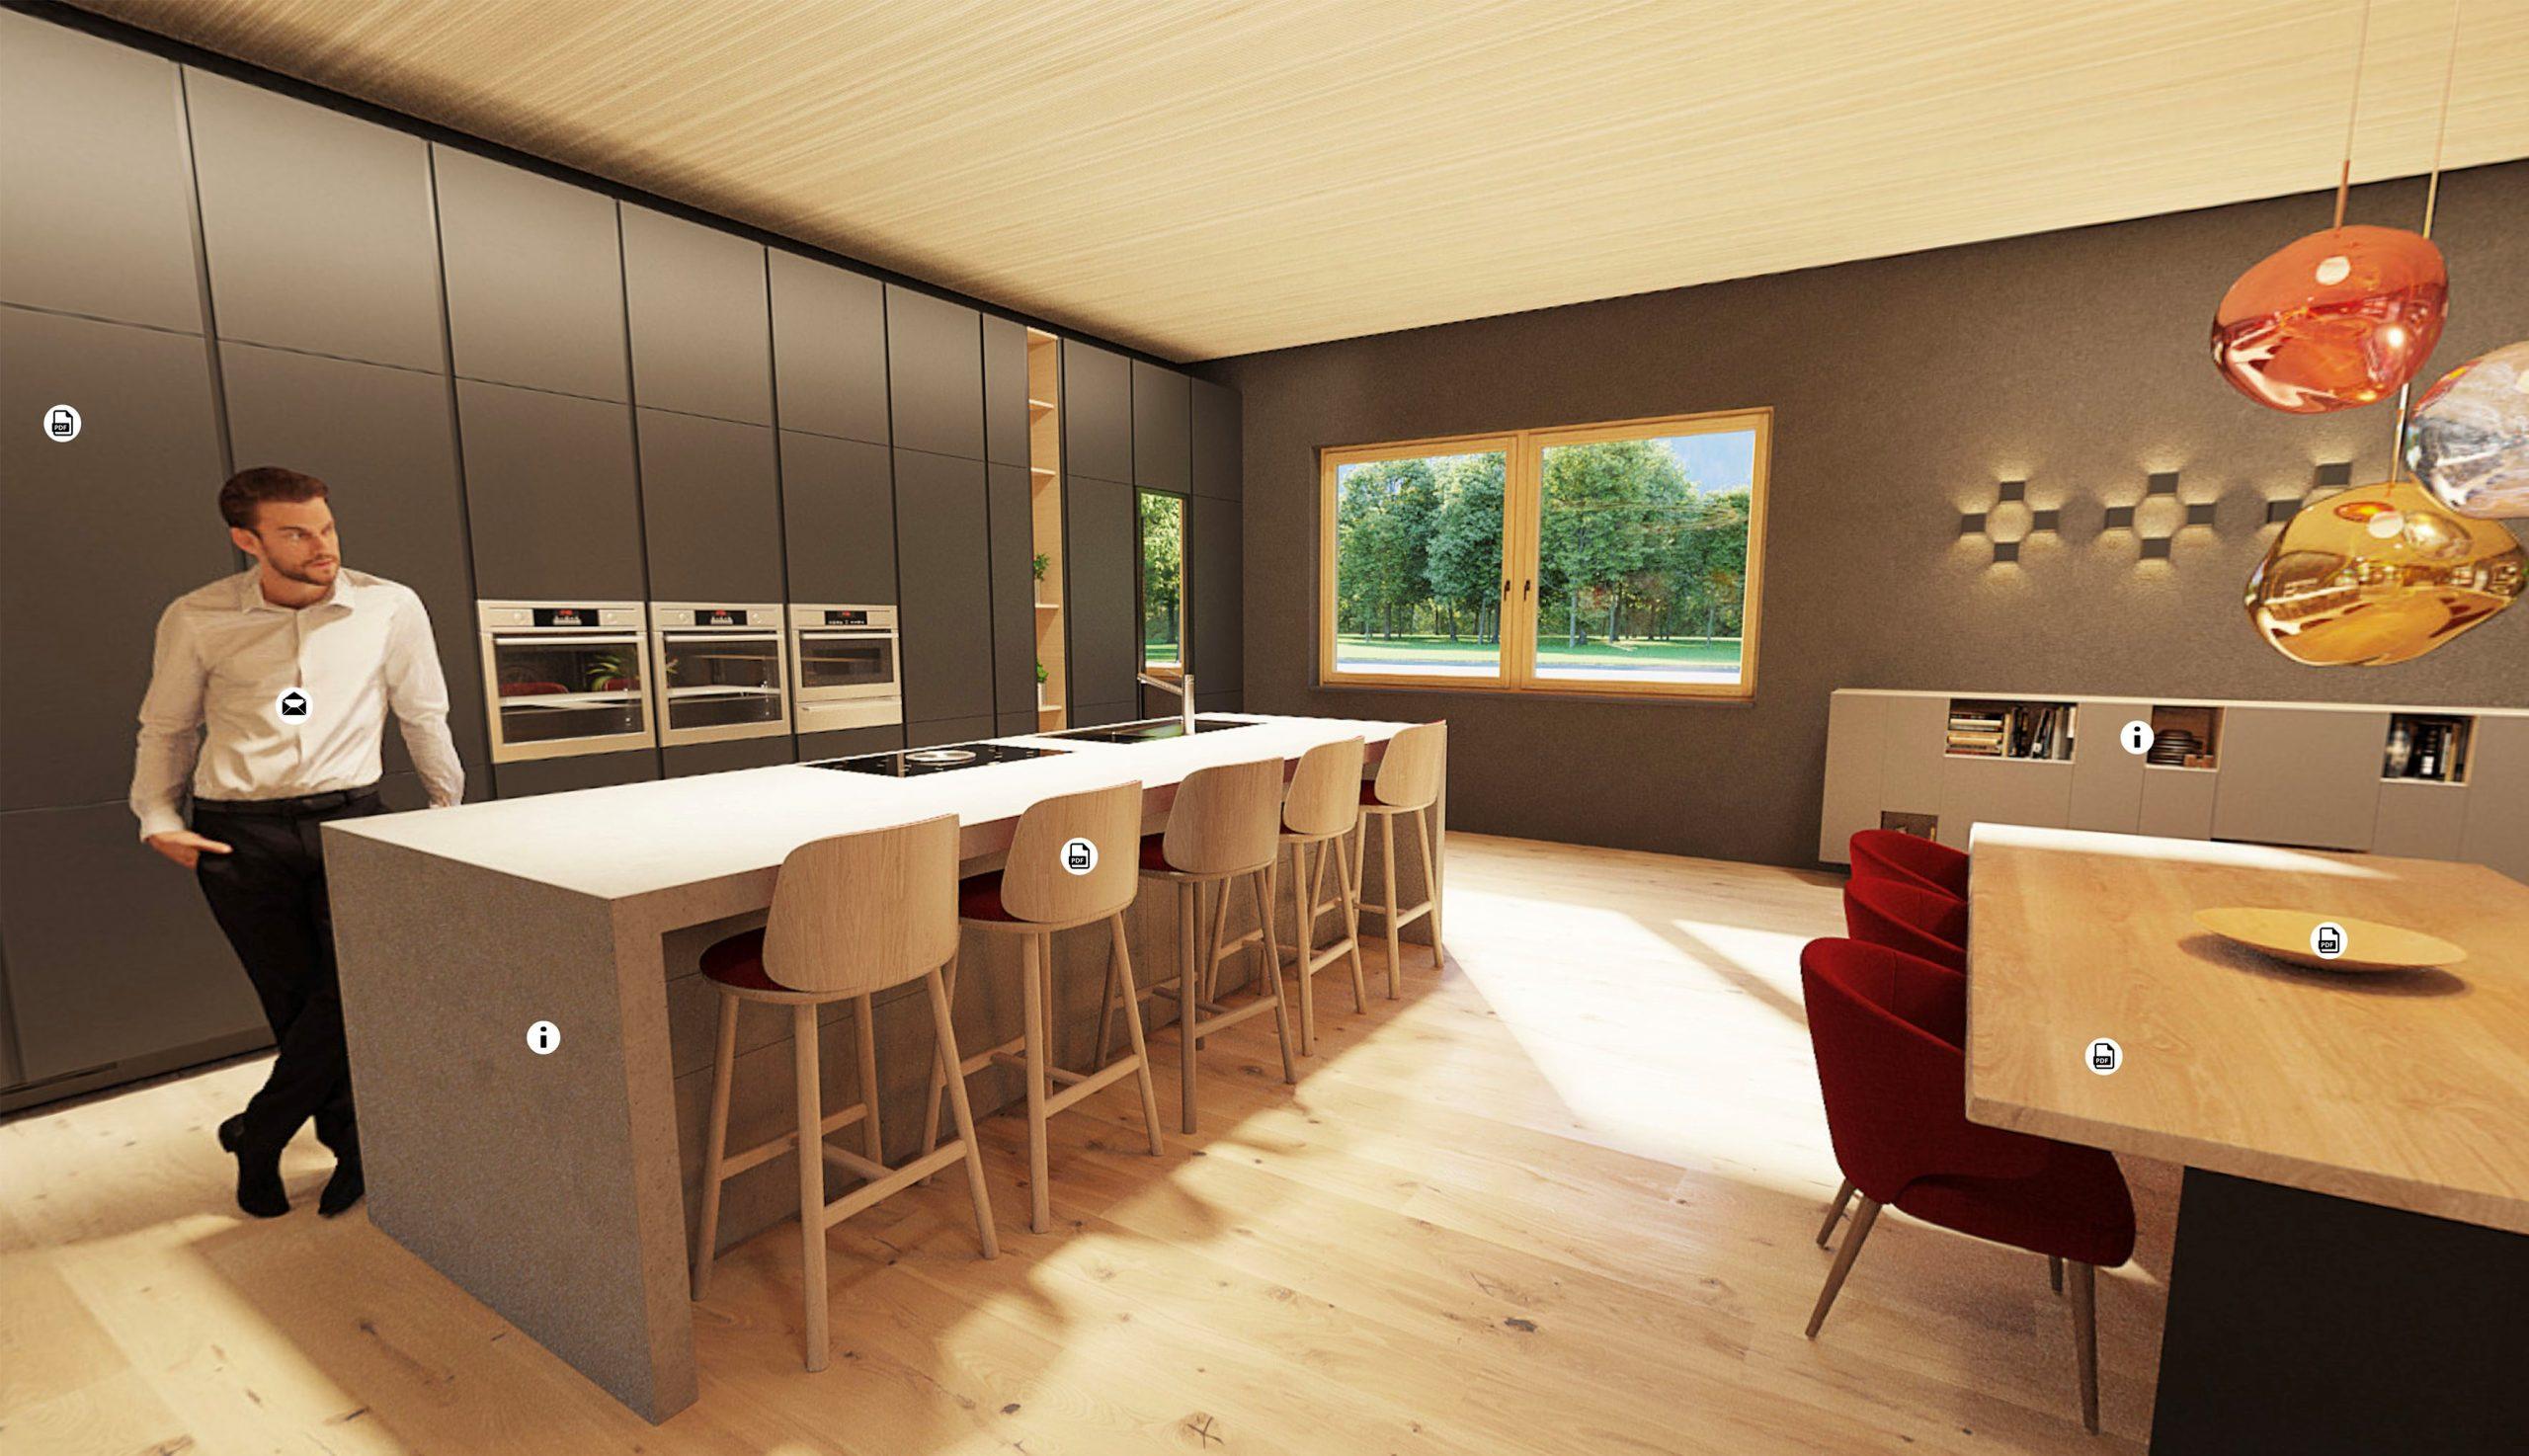 Virtuelle Küche